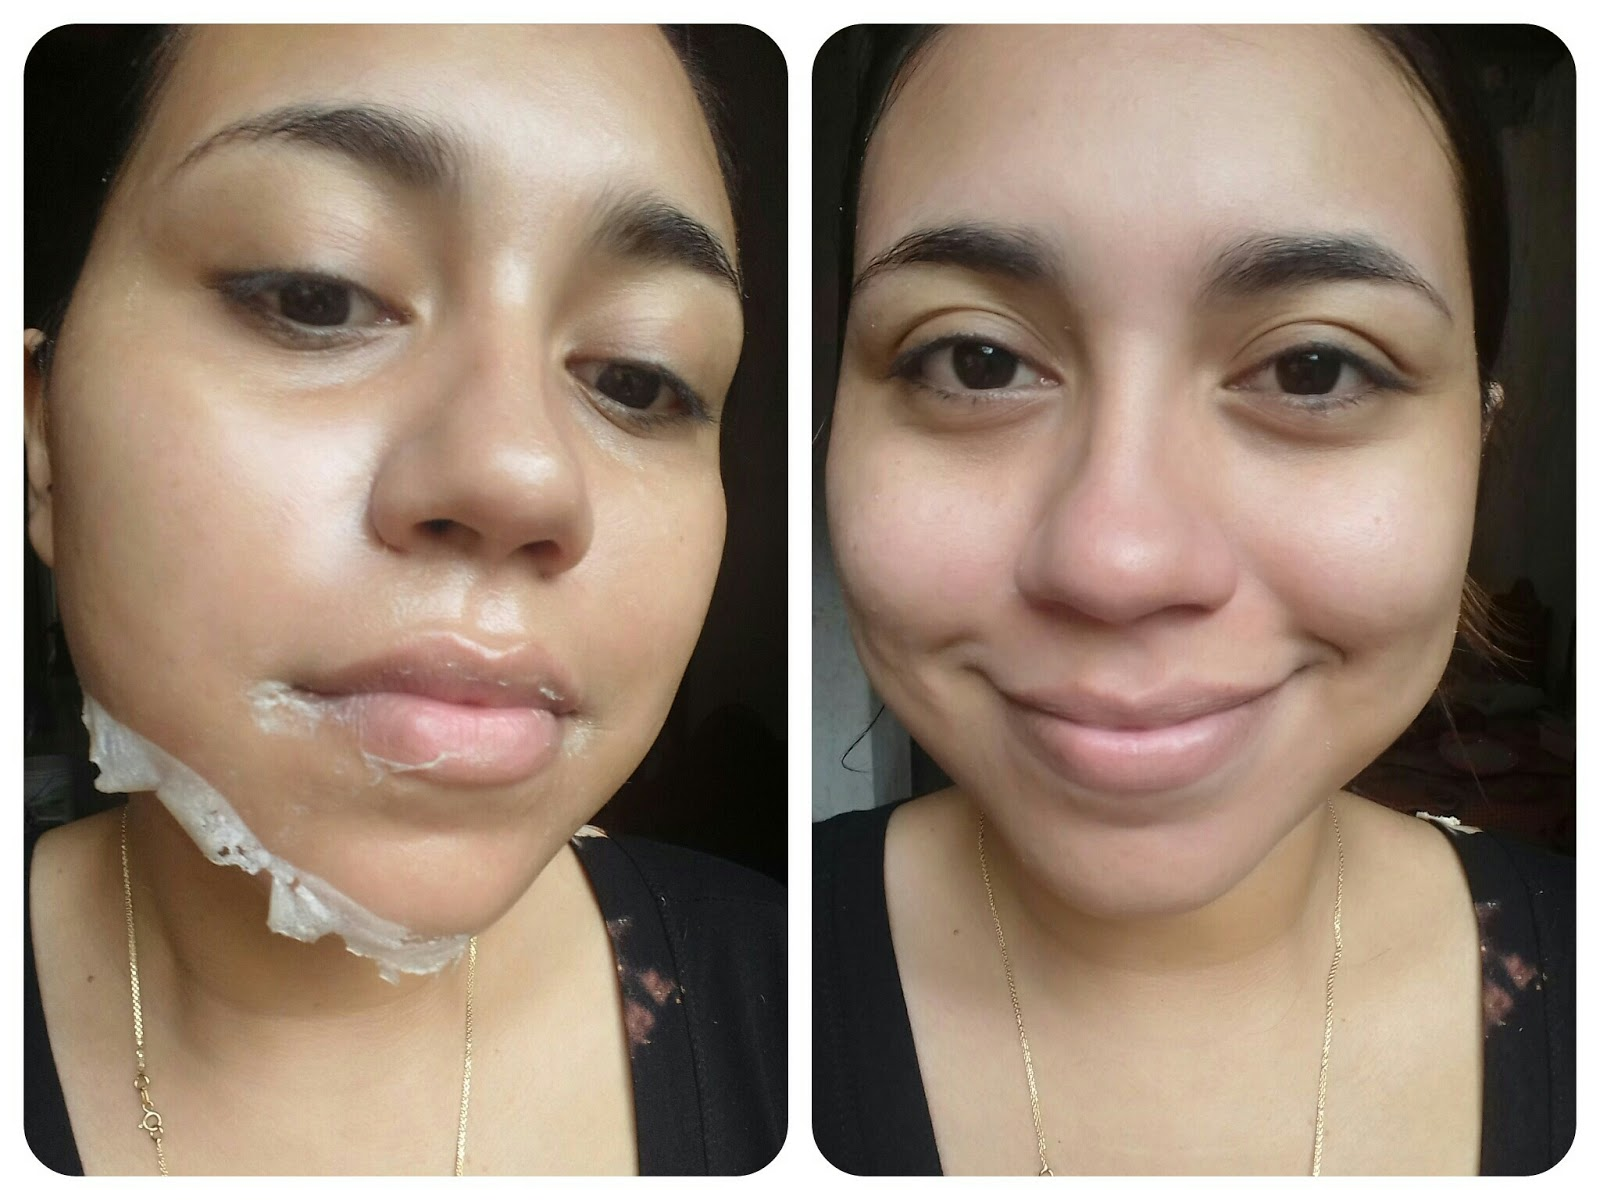 Máscara para retirar cravinhos do rosto.